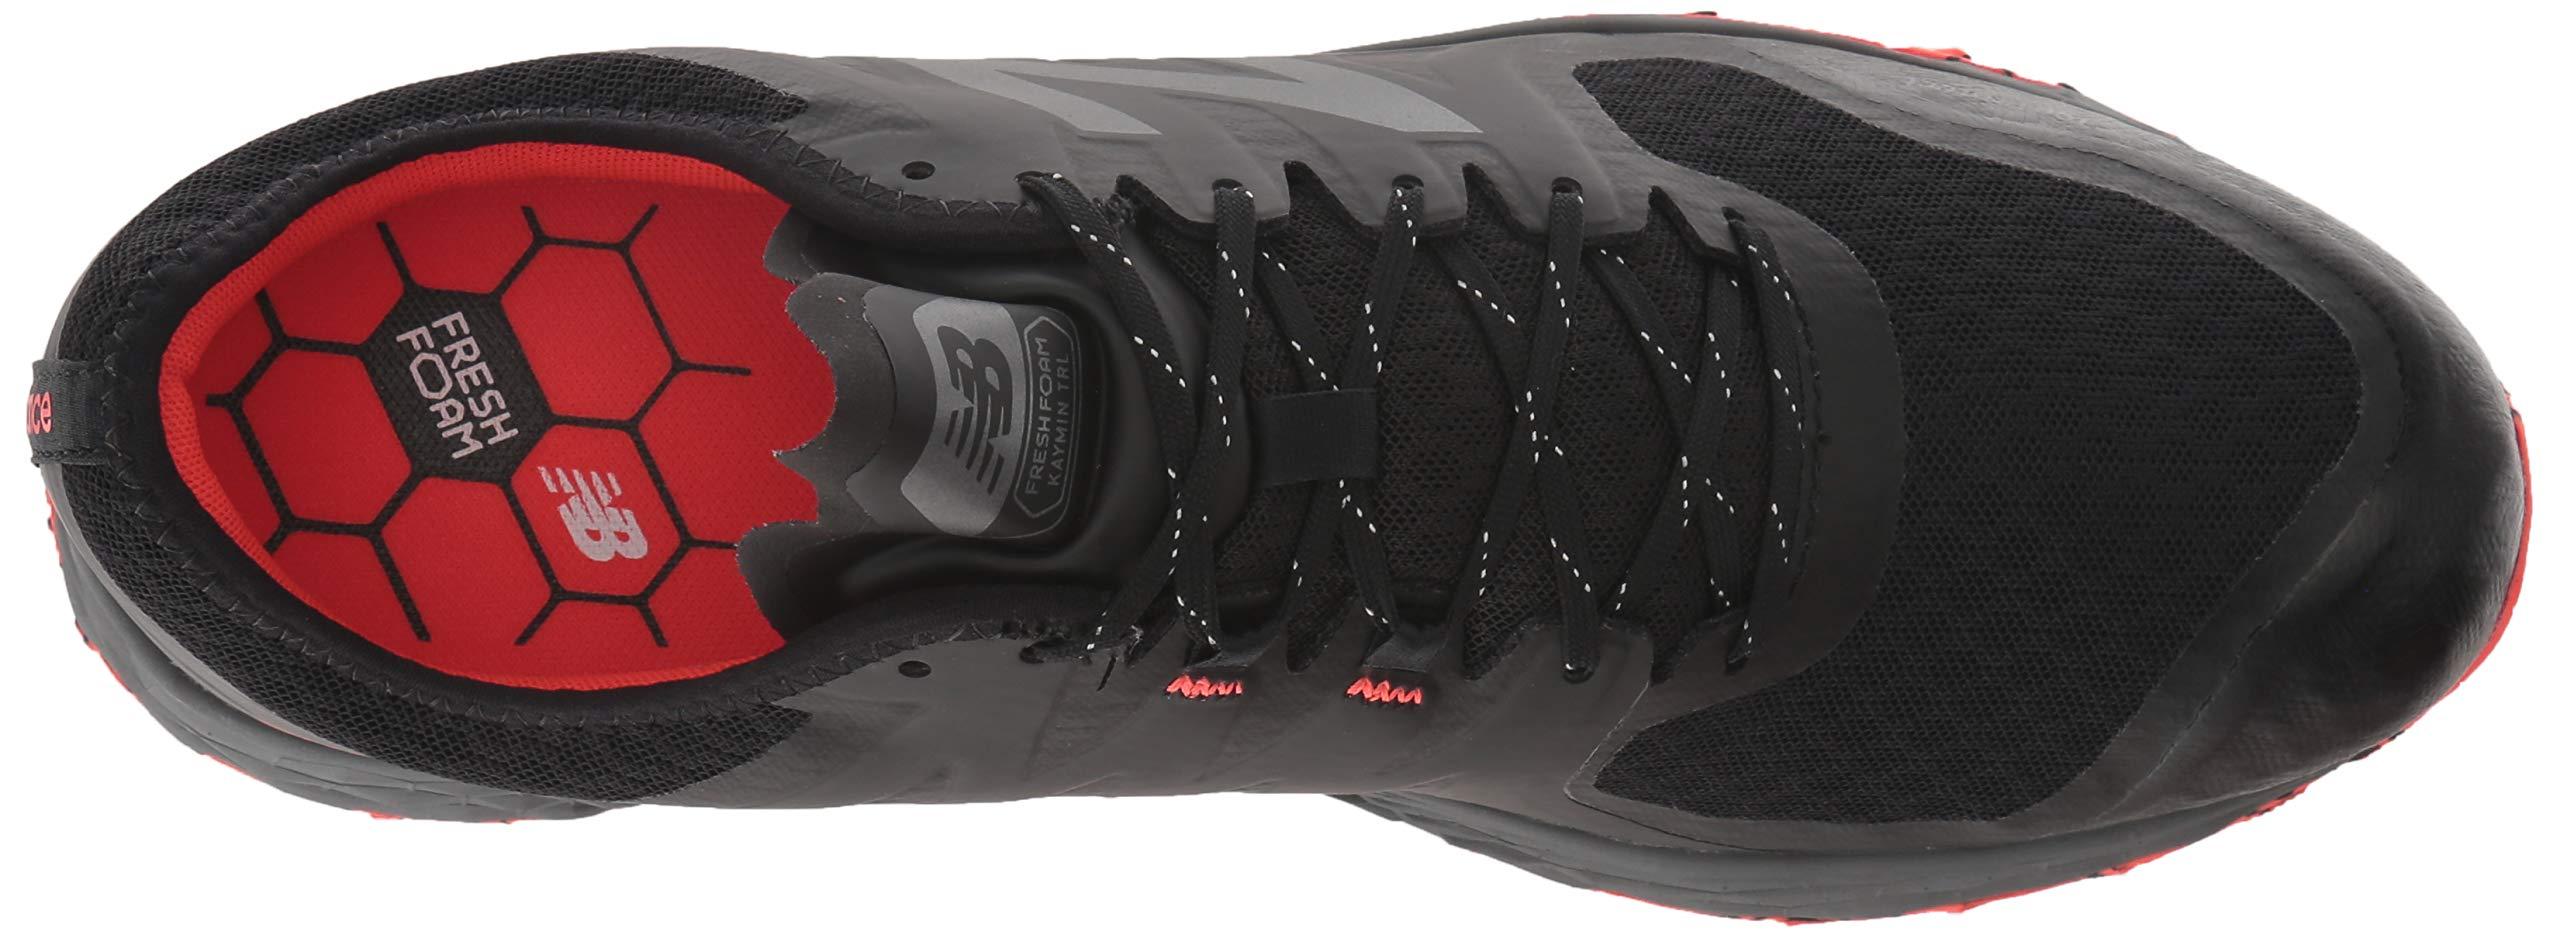 New Balance Men's Kaymin V1 Fresh Foam Trail Running Shoe, Black/Flame/Reflective, 1.5 D US by New Balance (Image #8)